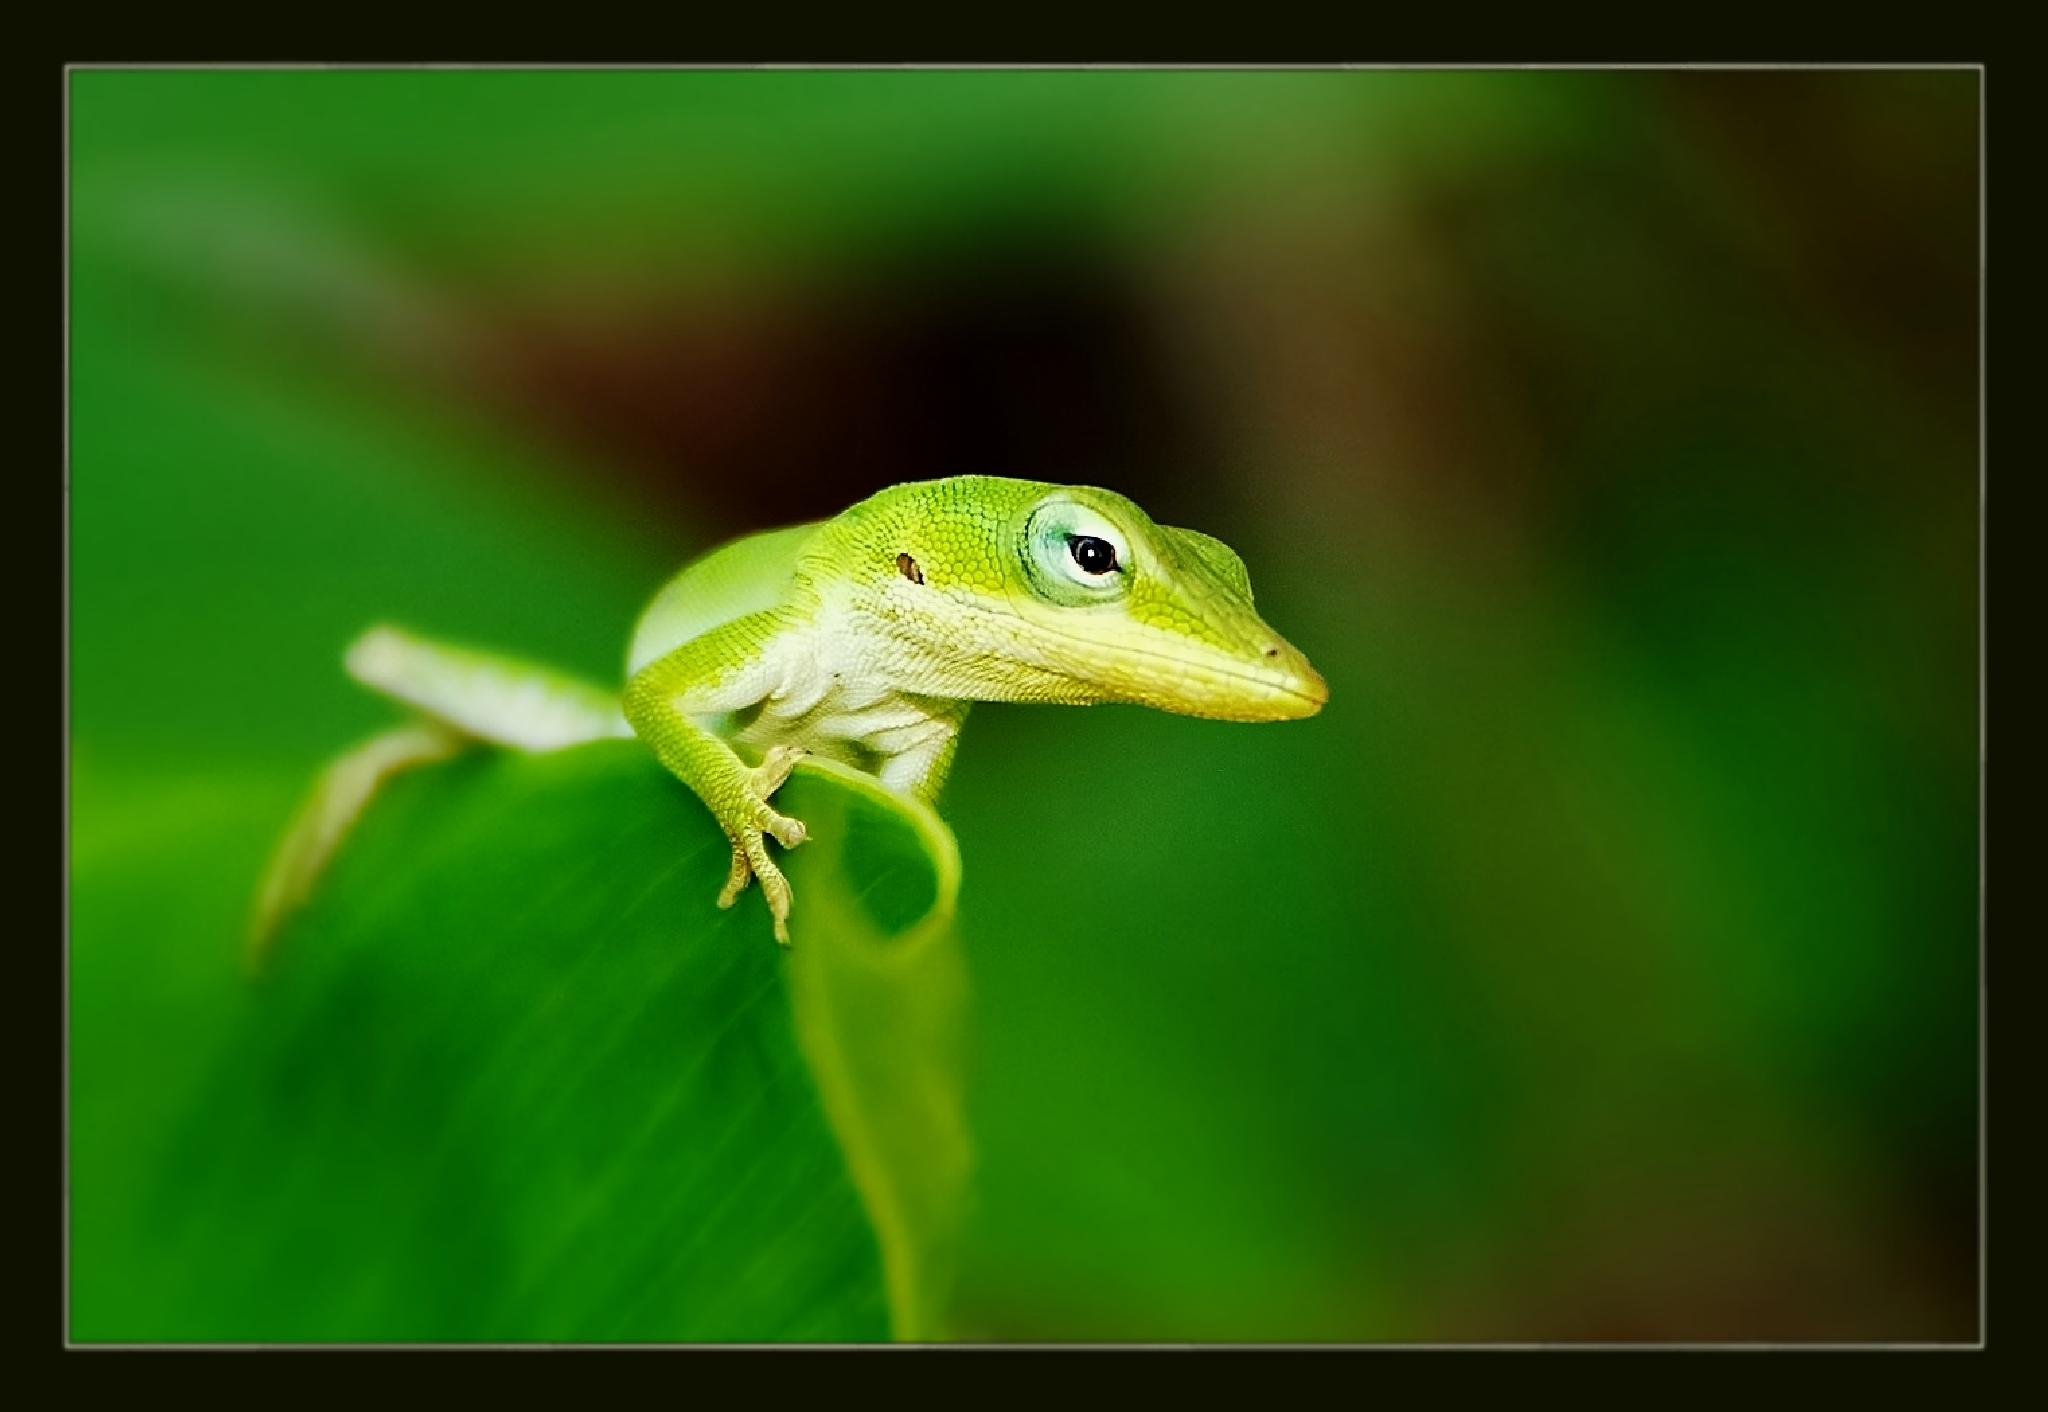 salamander by miwwim